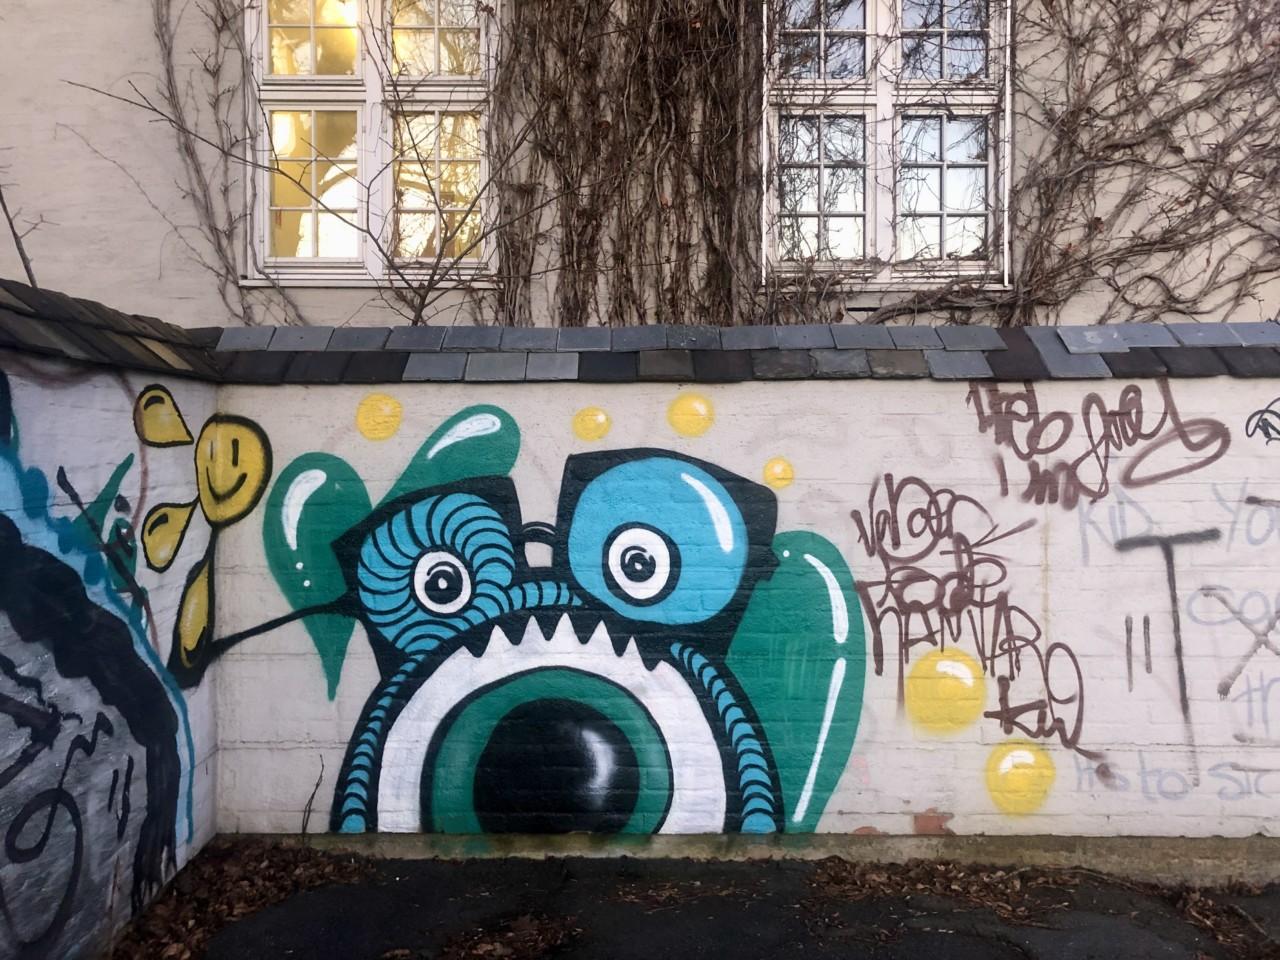 grafitti-oslo-monster-oslove-frykt